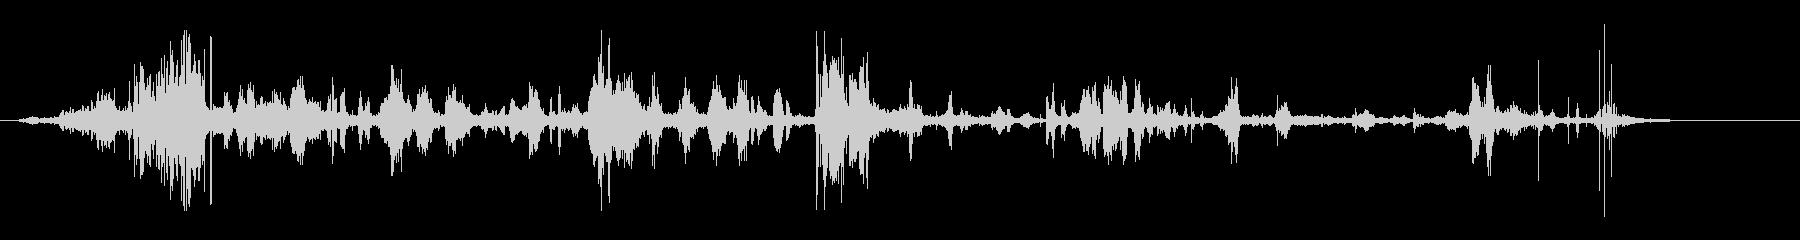 CAMEL MANOEUVER、S...の未再生の波形